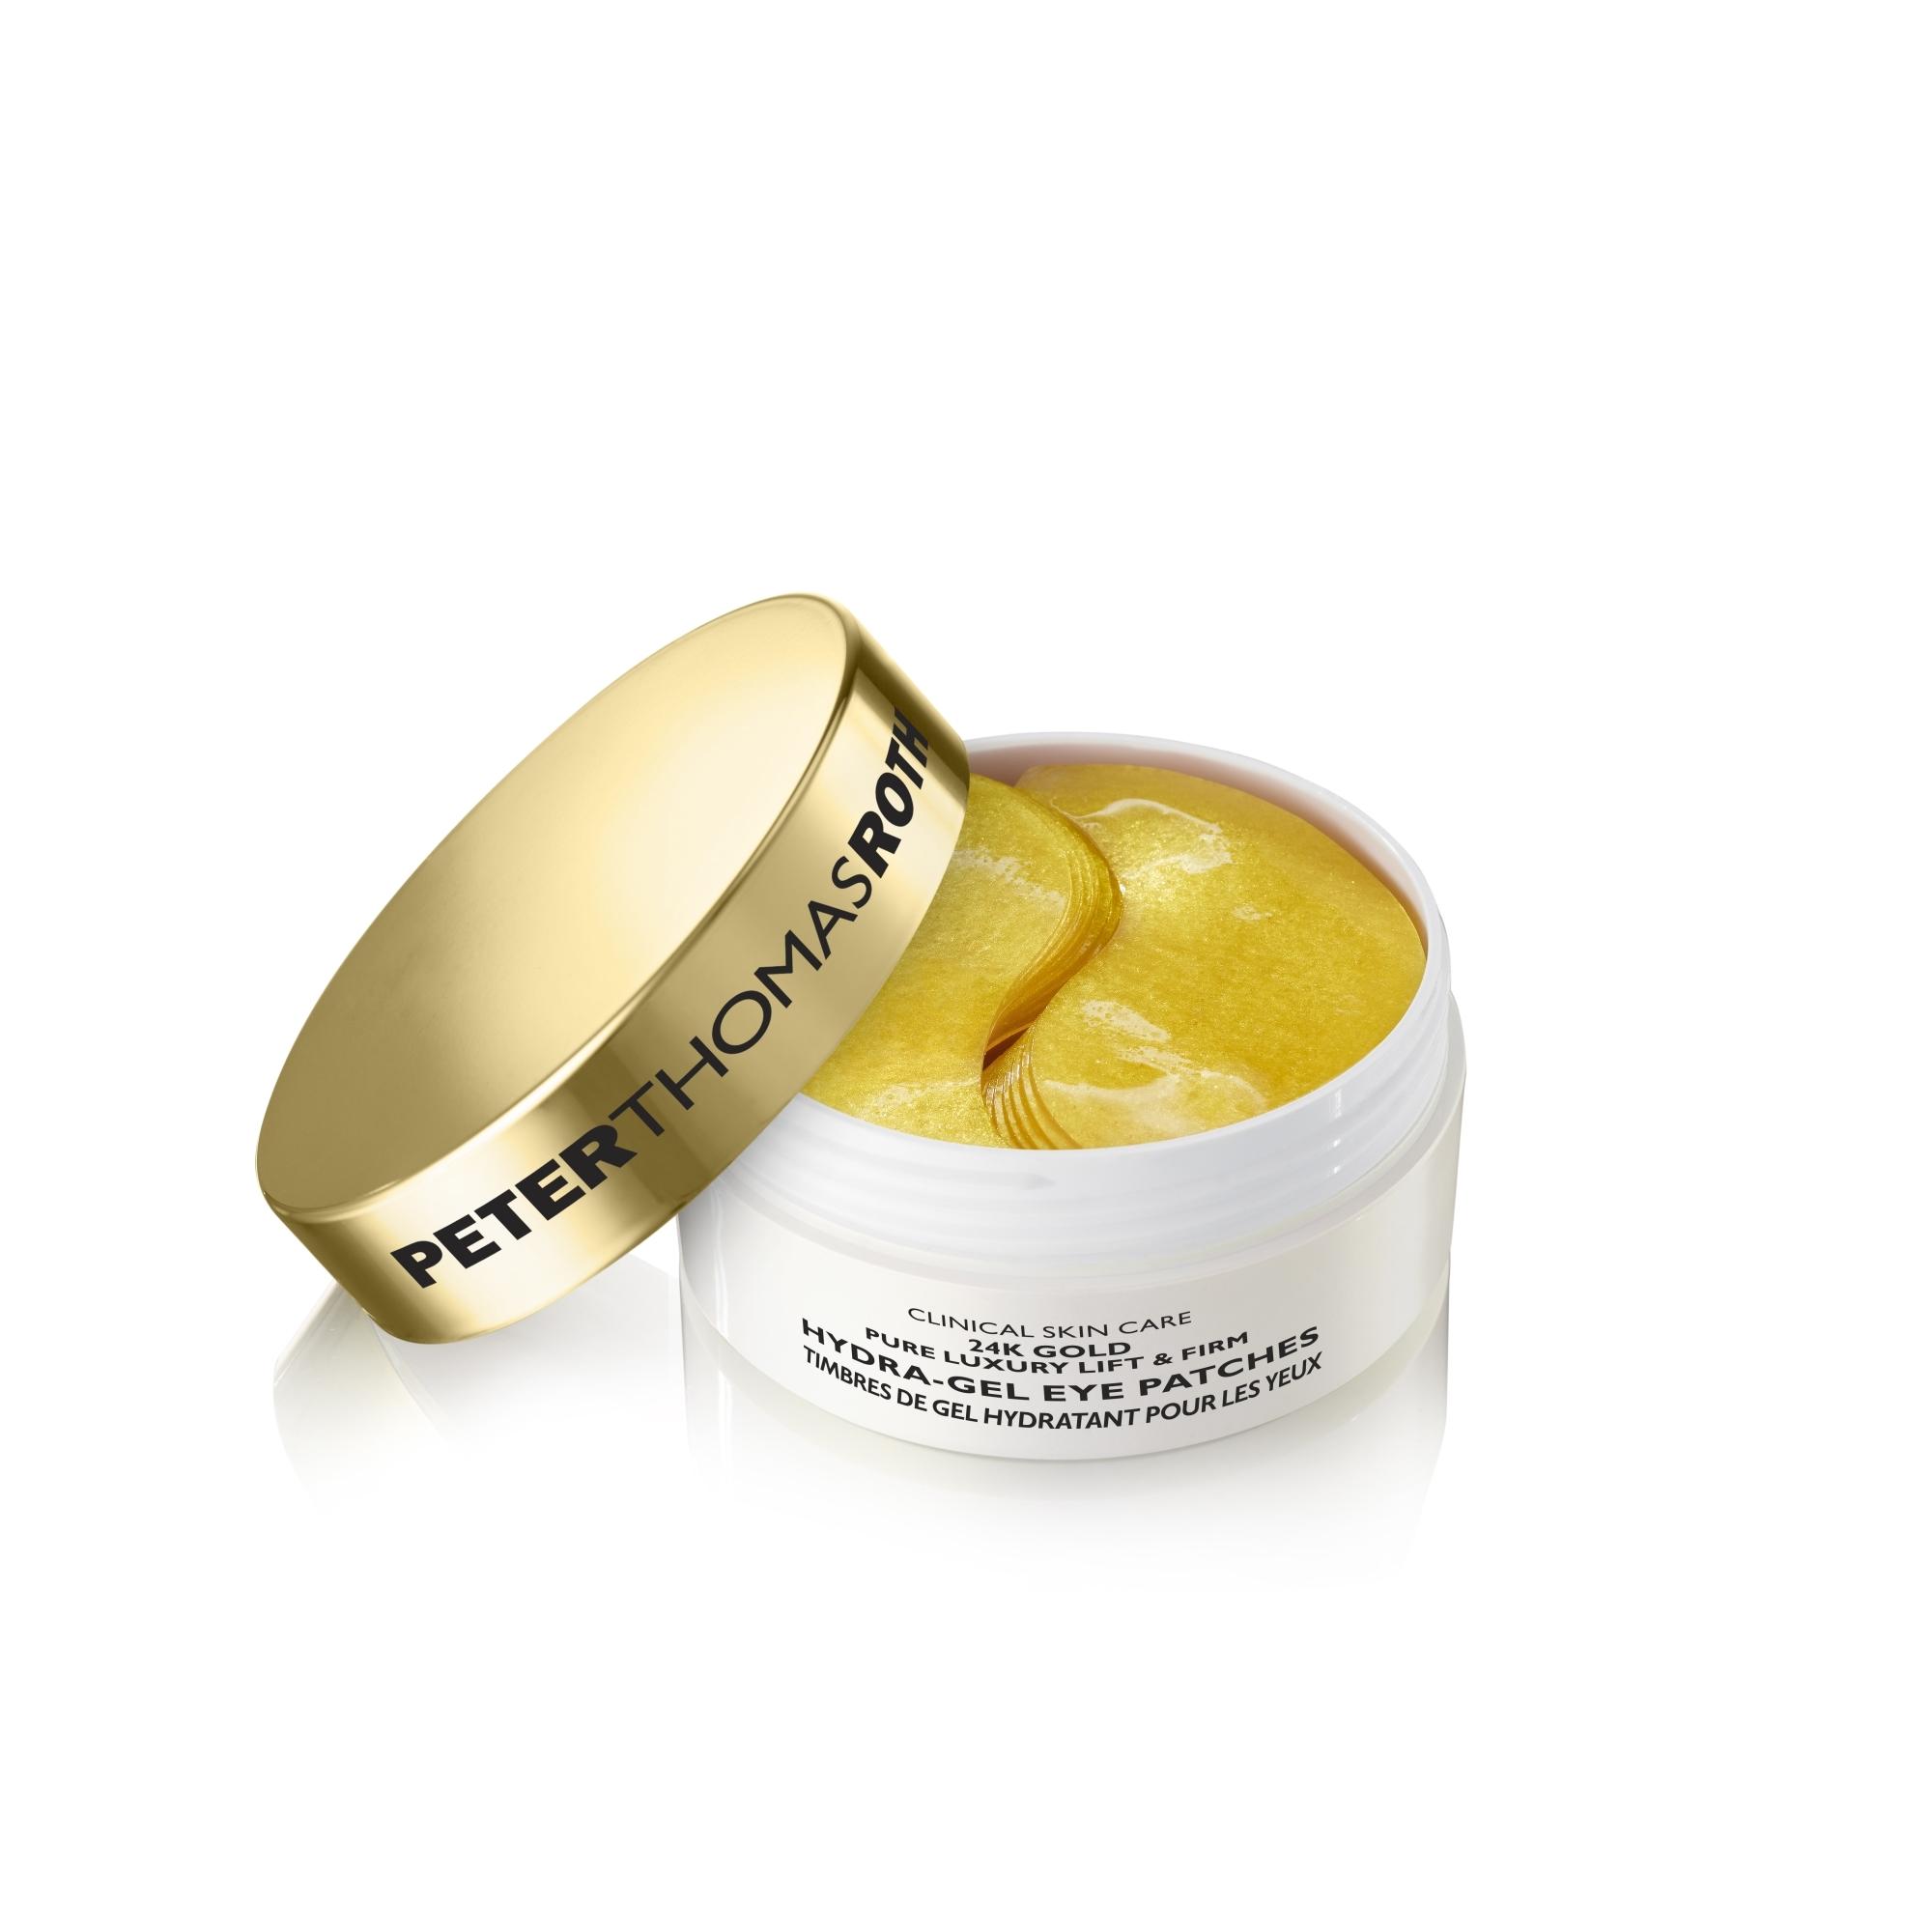 24K Gold Hydra-Gel Eye Patches